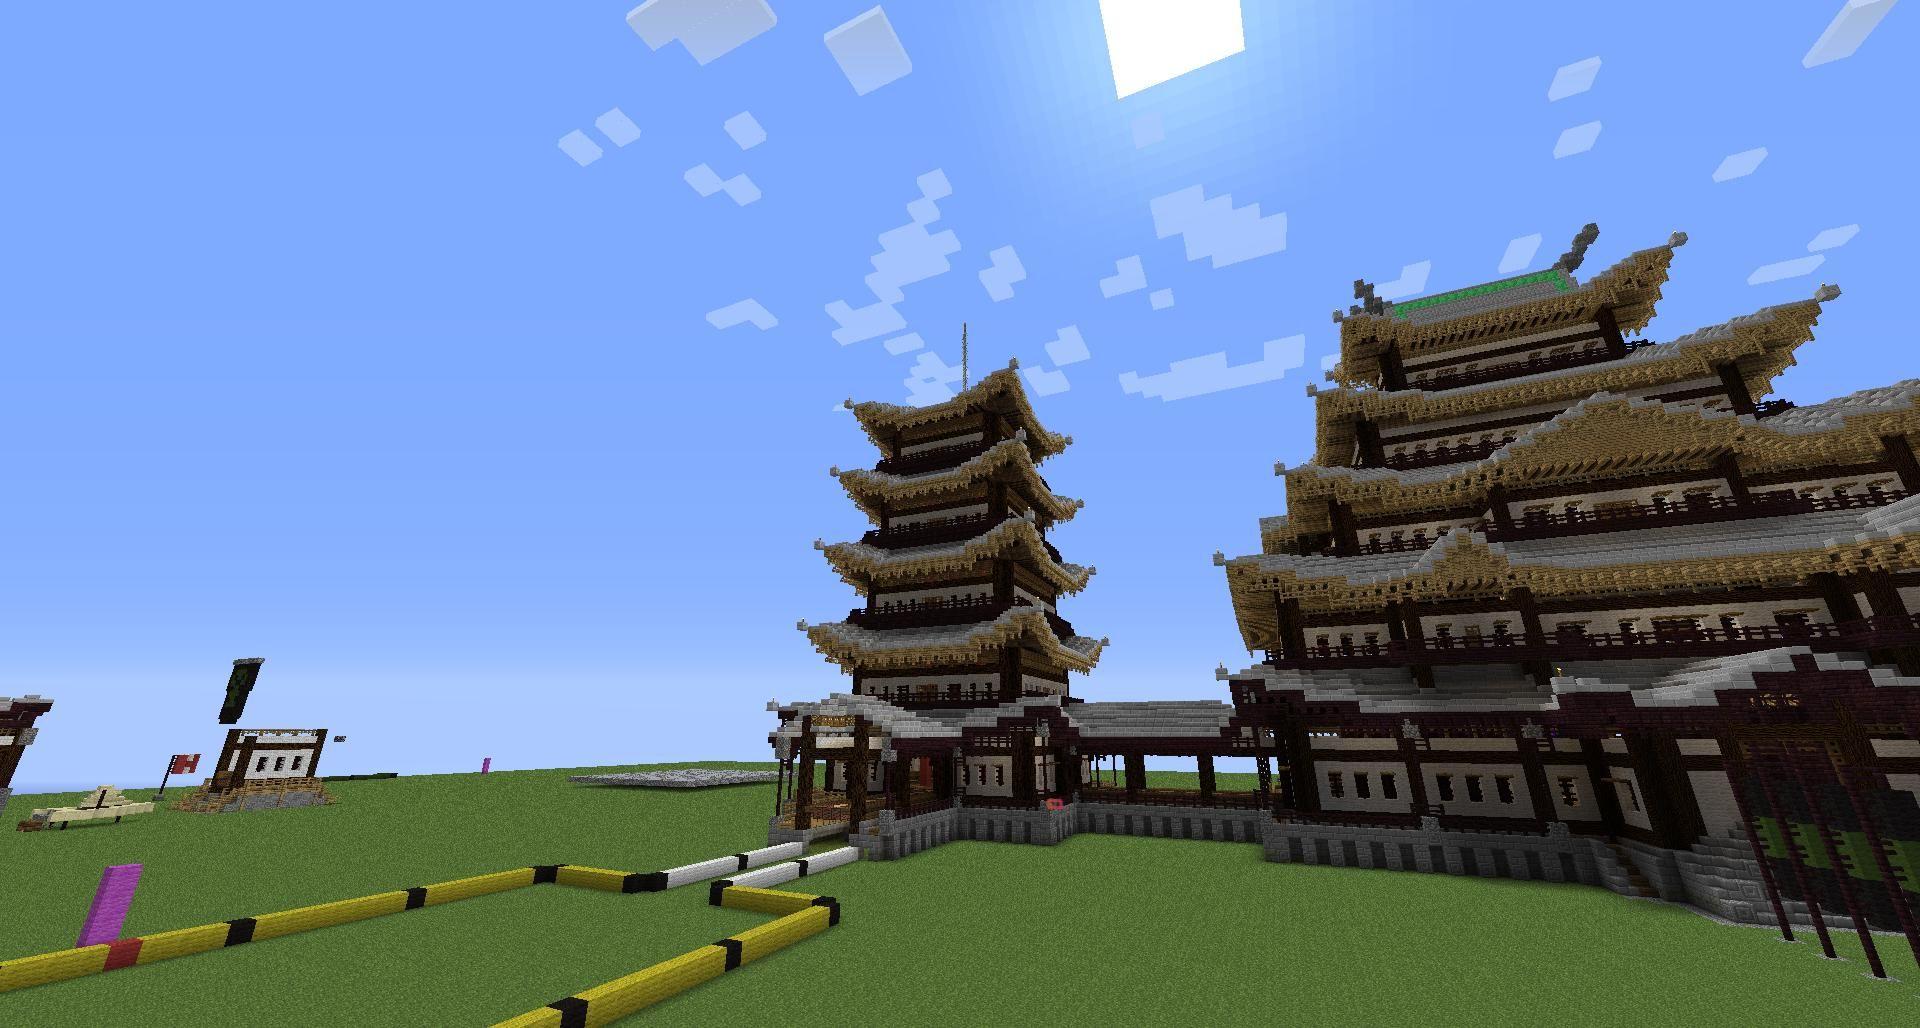 Minecraft japanese pagoda design awesome 57401 inspiration designs minecraft japanese pagoda design awesome 57401 inspiration designs publicscrutiny Gallery